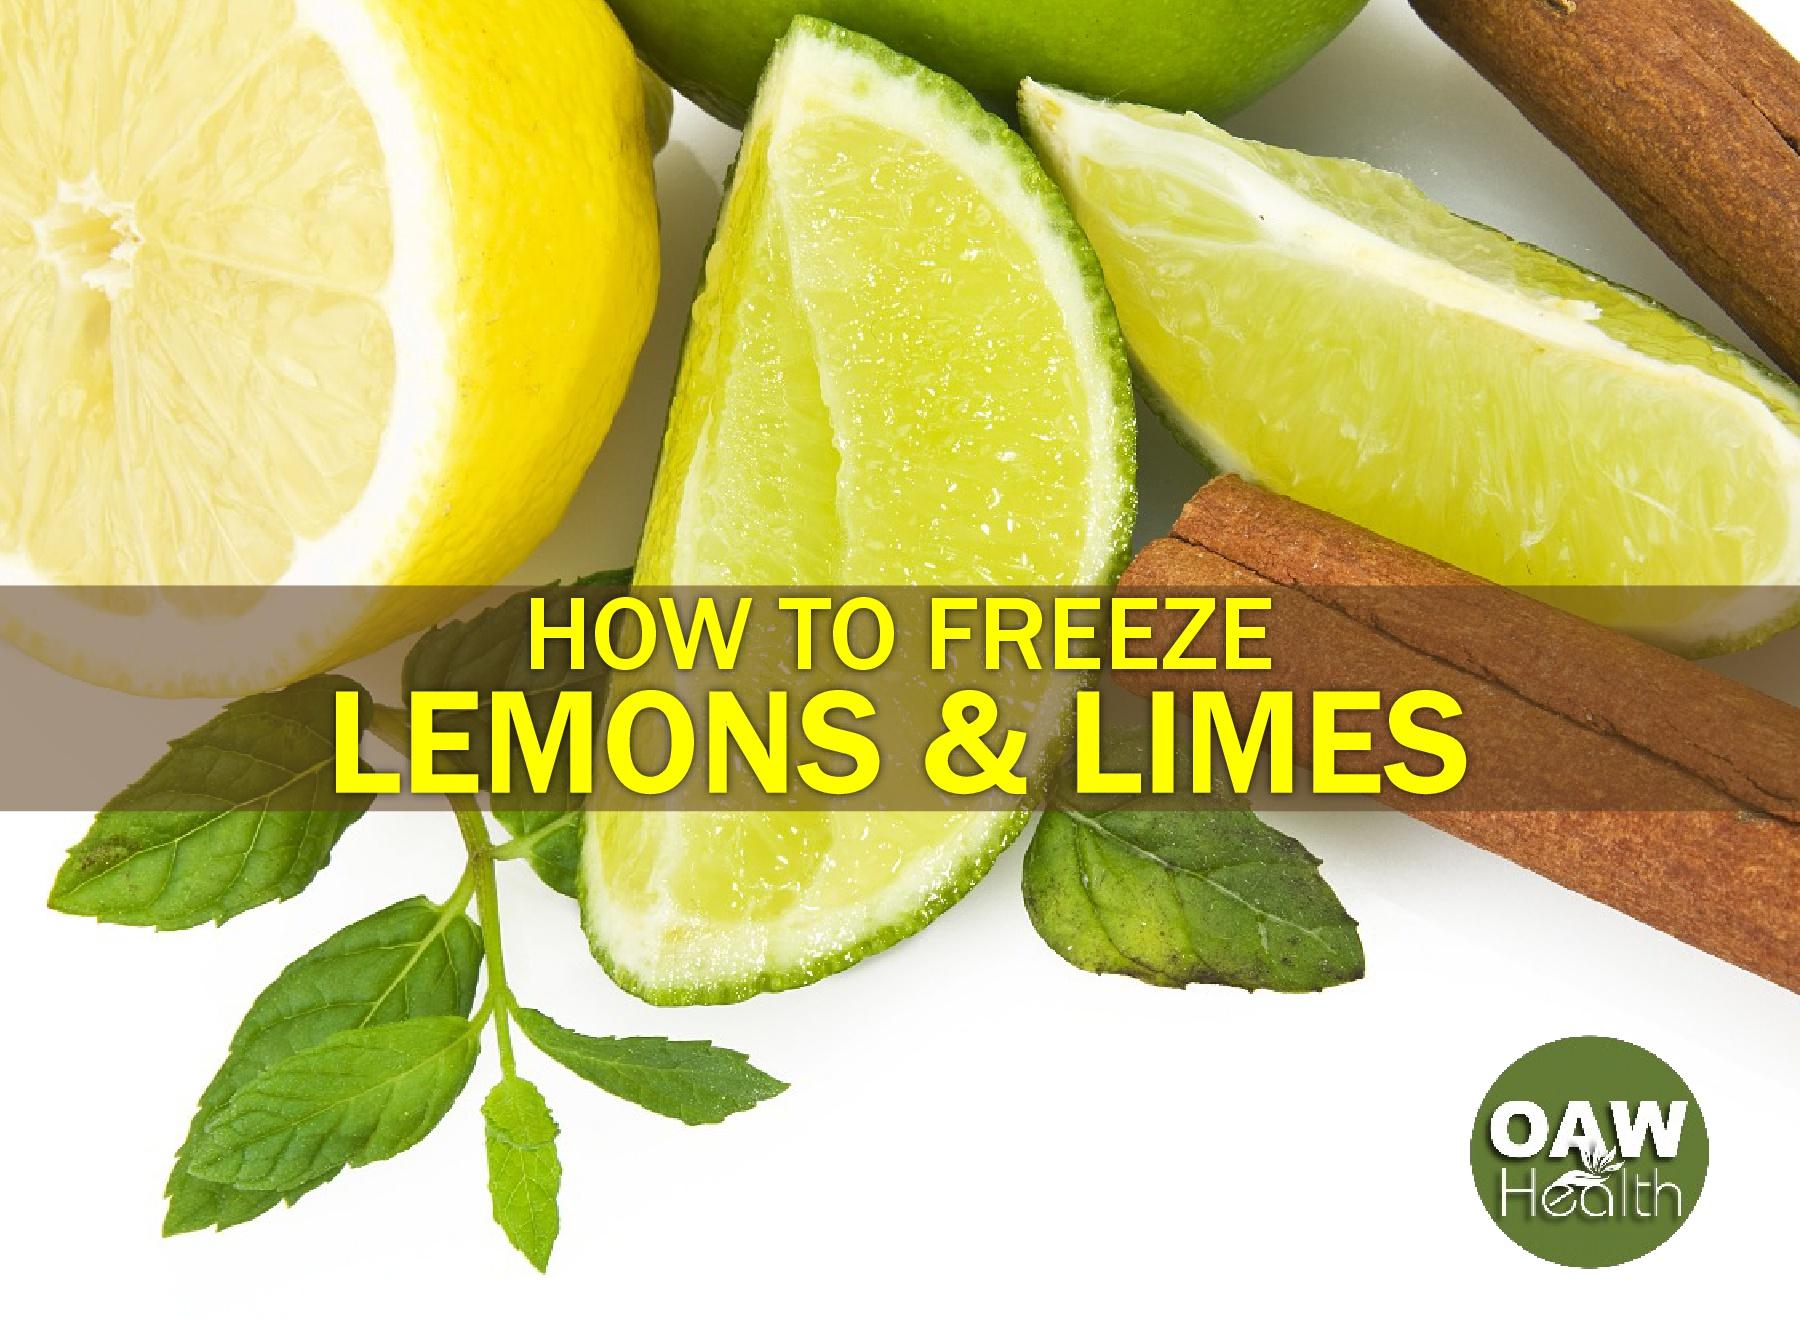 How to Freeze Lemons and Limes